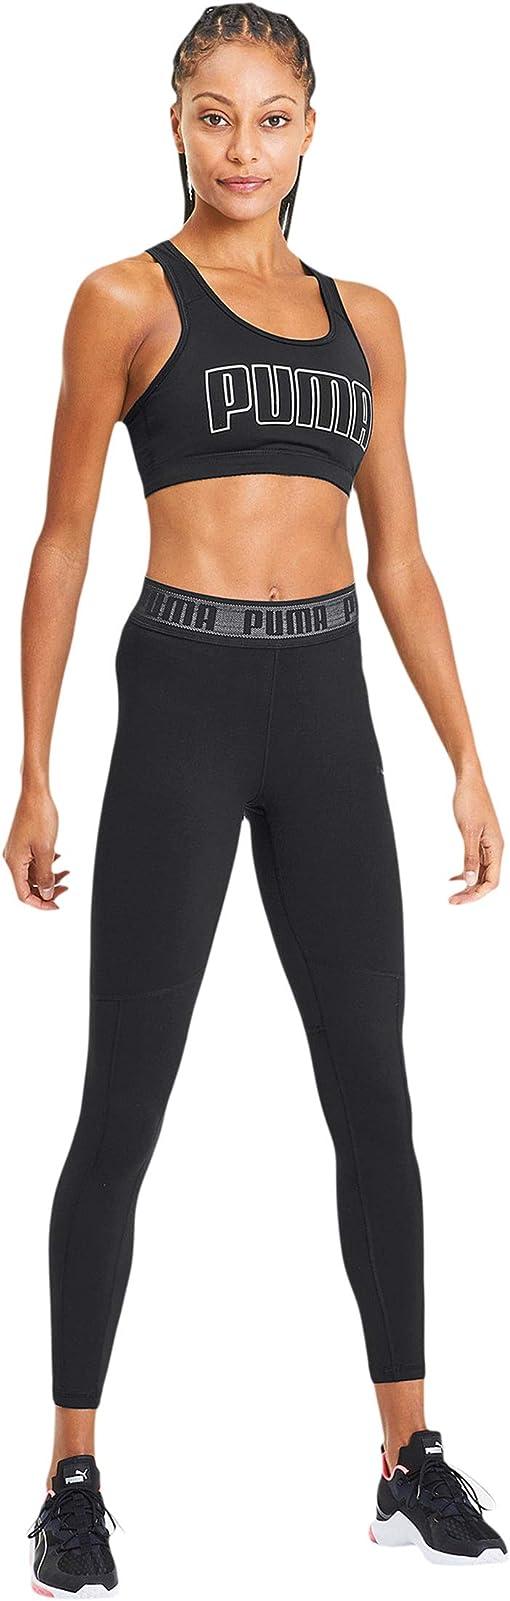 Puma Black/Puma White/Metallic Silver Puma